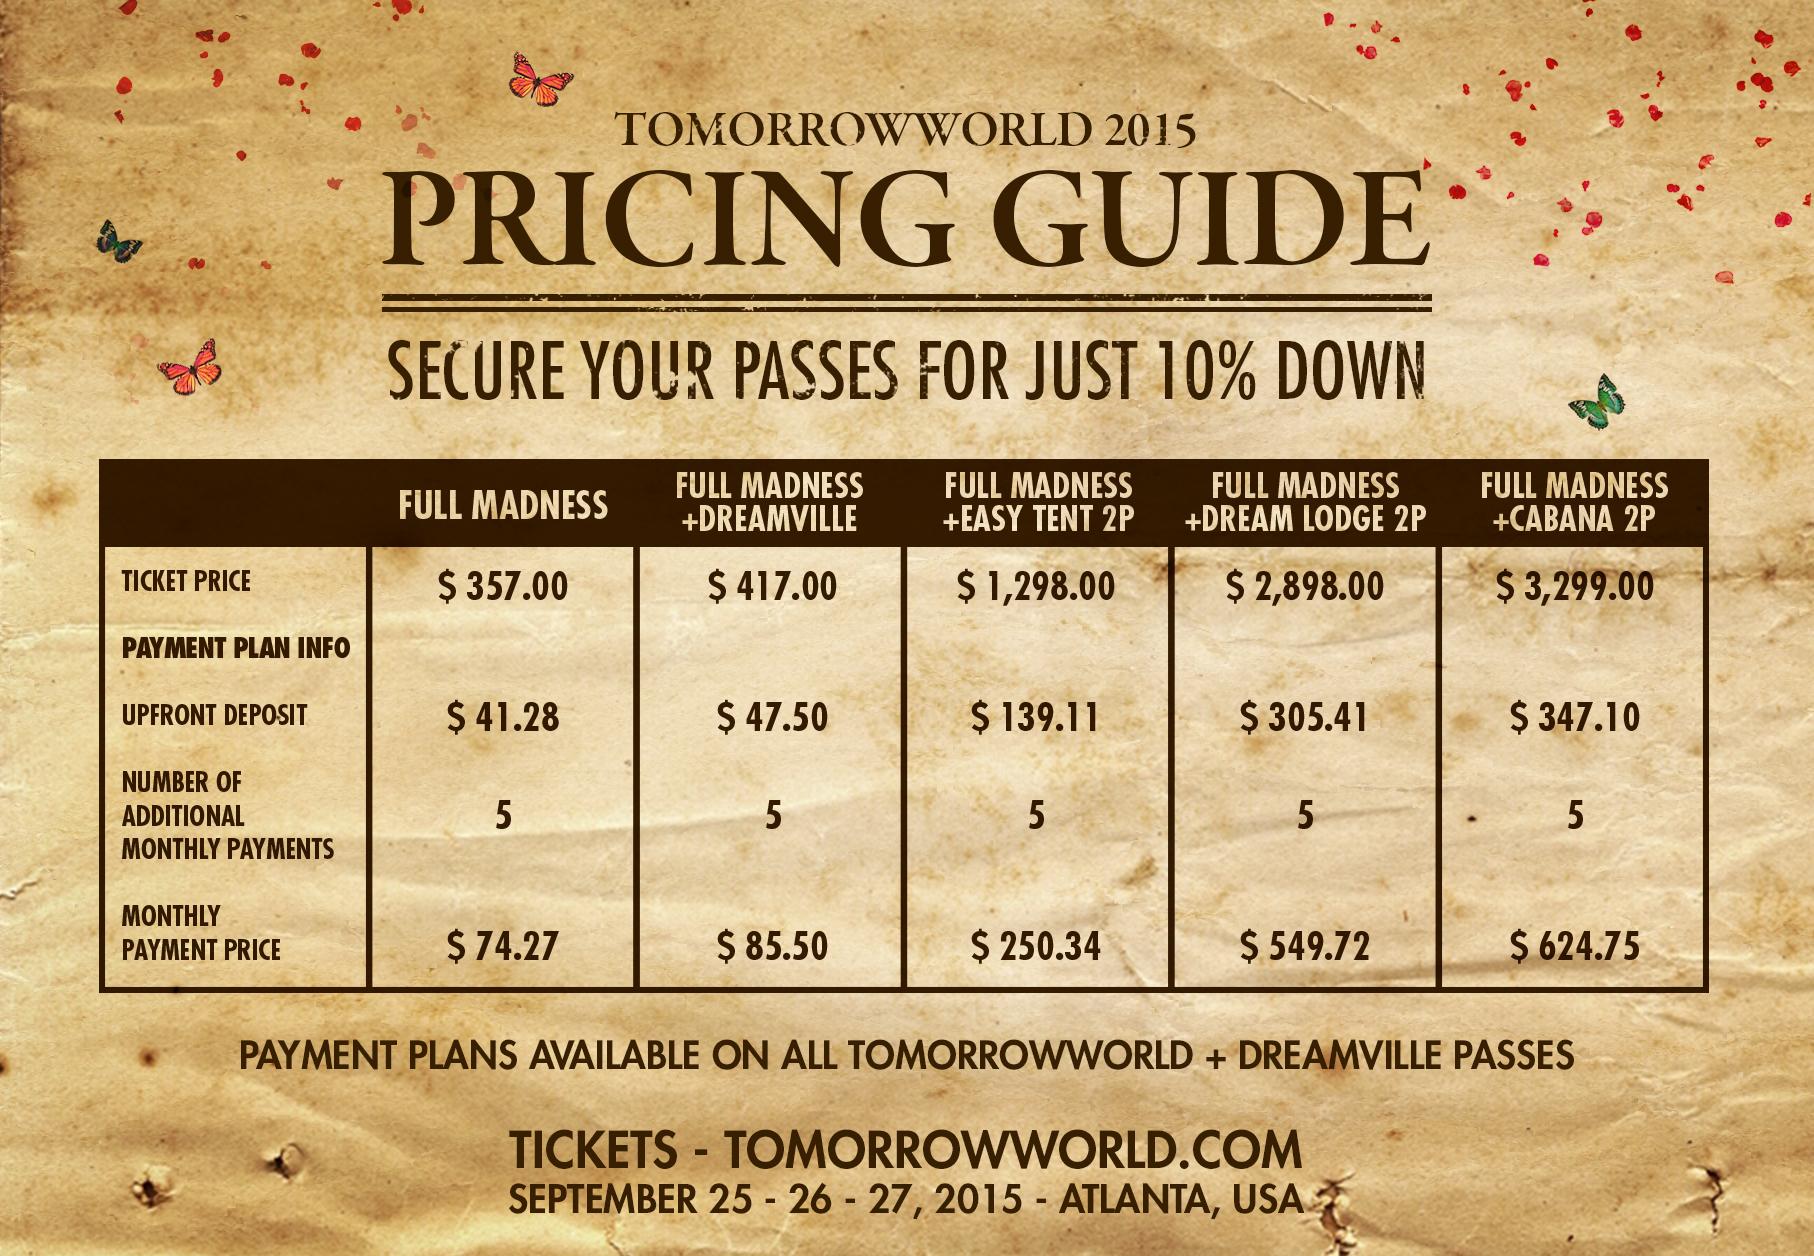 TomorrowworldPricingGuide